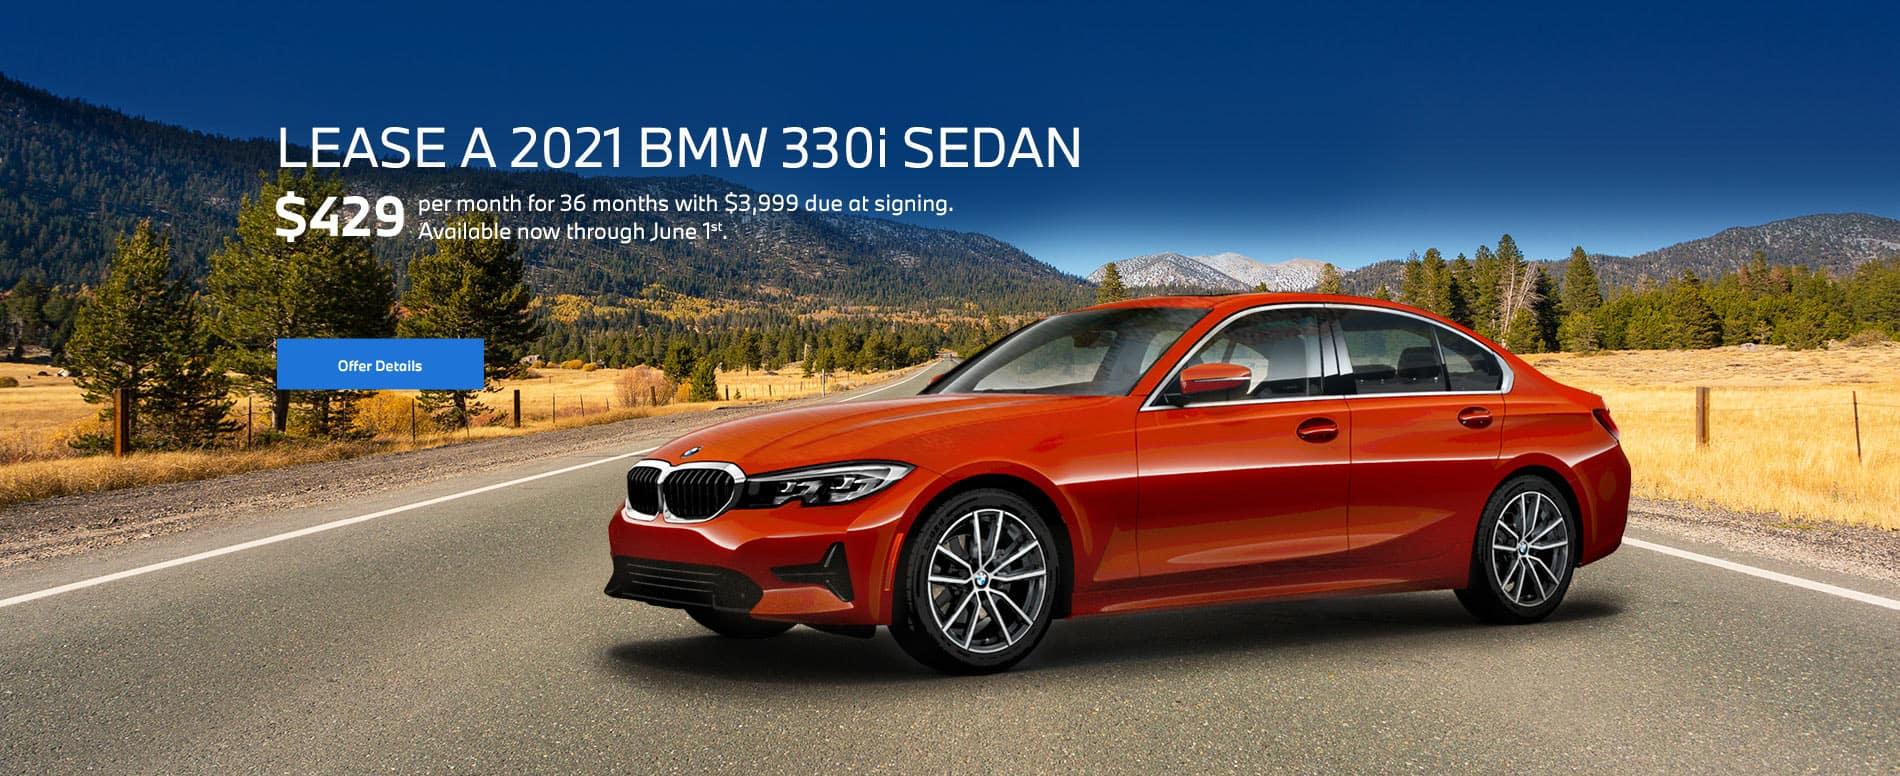 BMWMeridian_Slide_300x300_330i_05-21